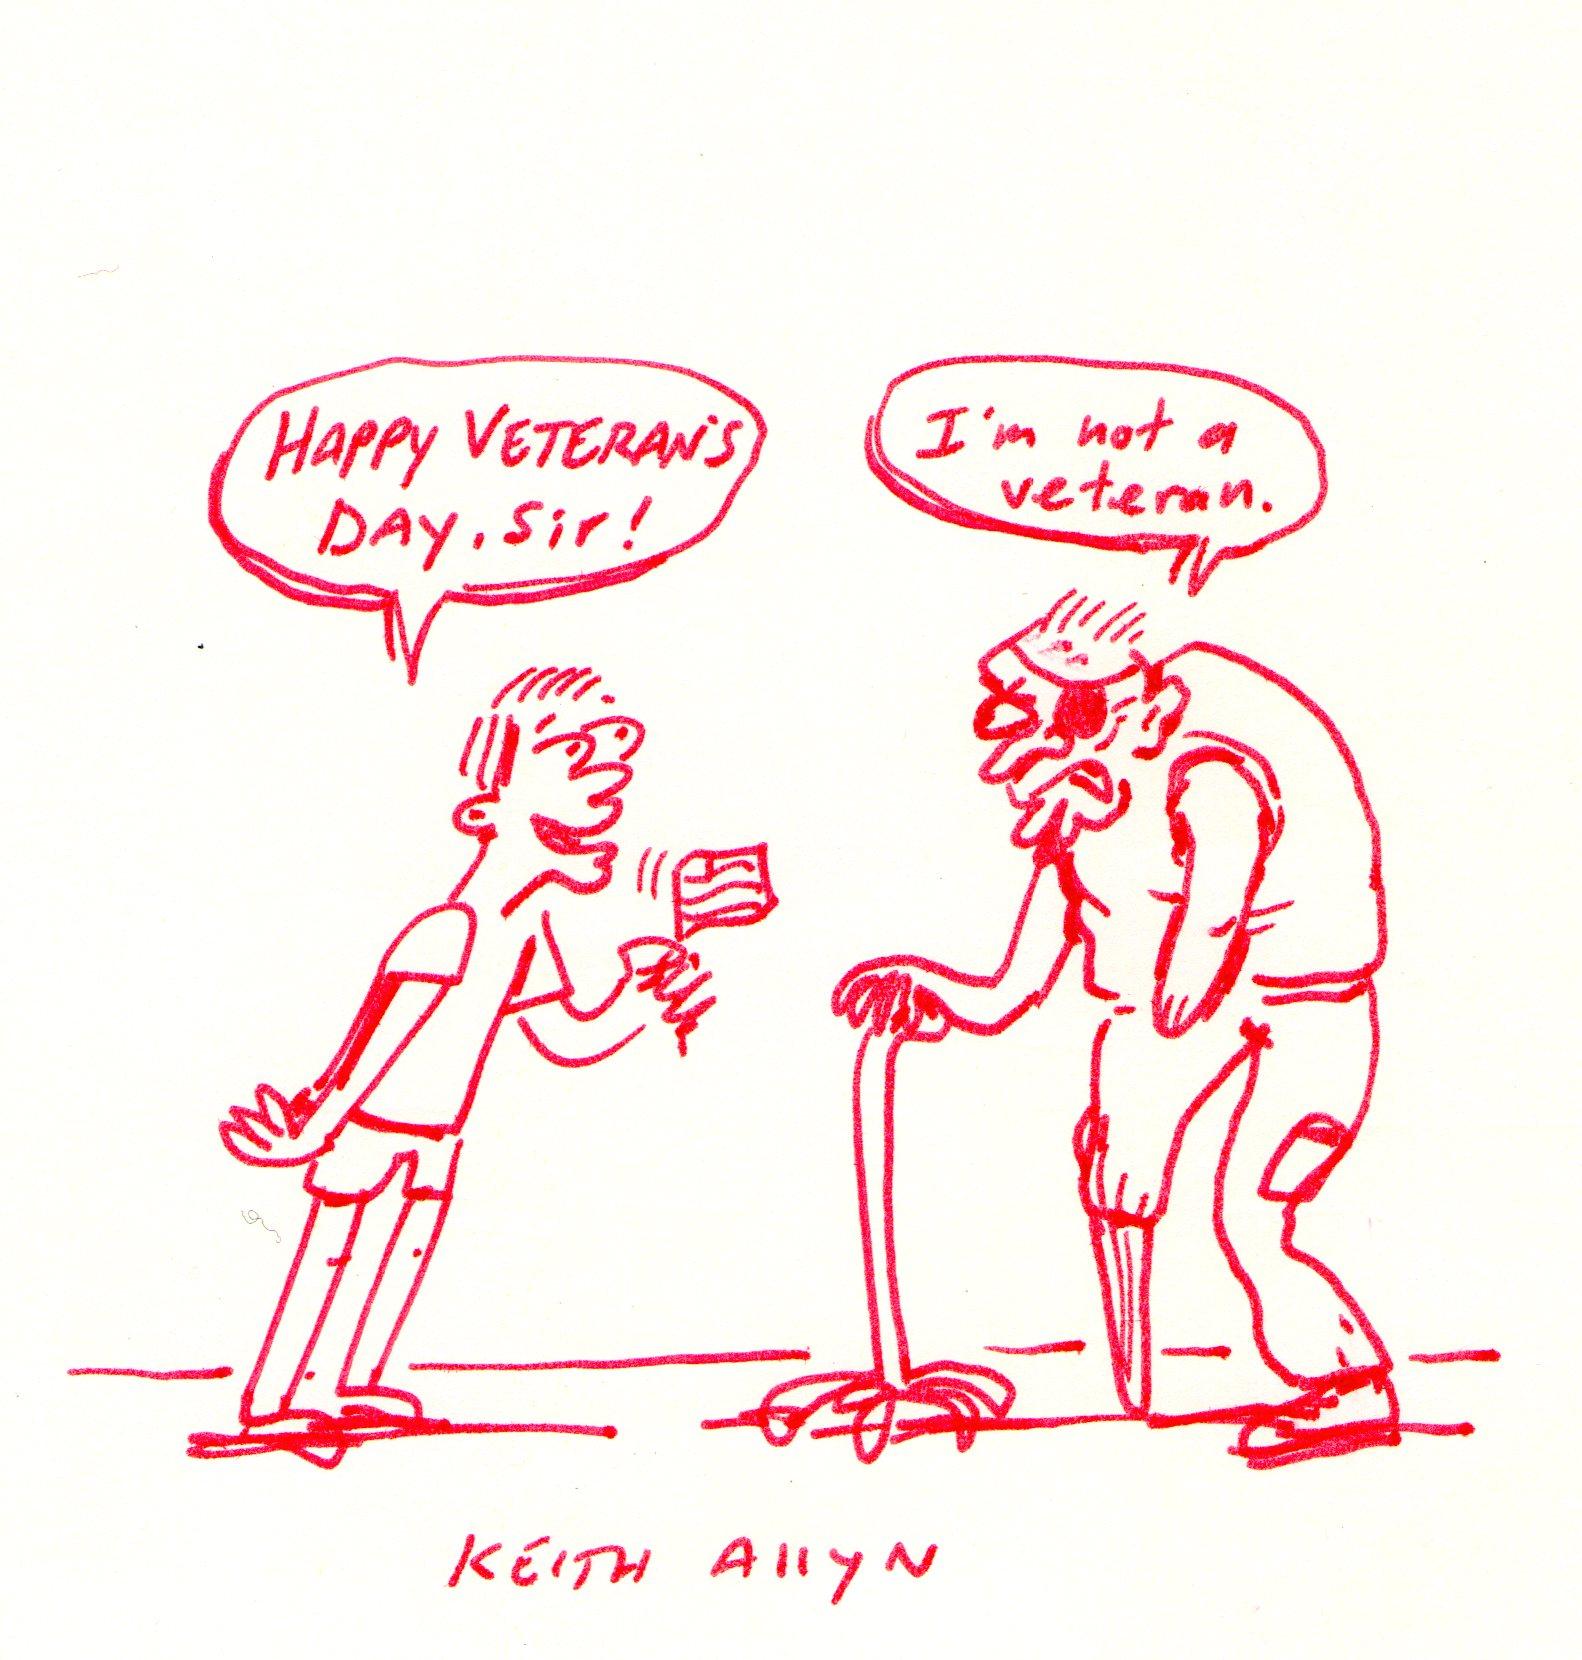 veterans day cartoon, keithallyn